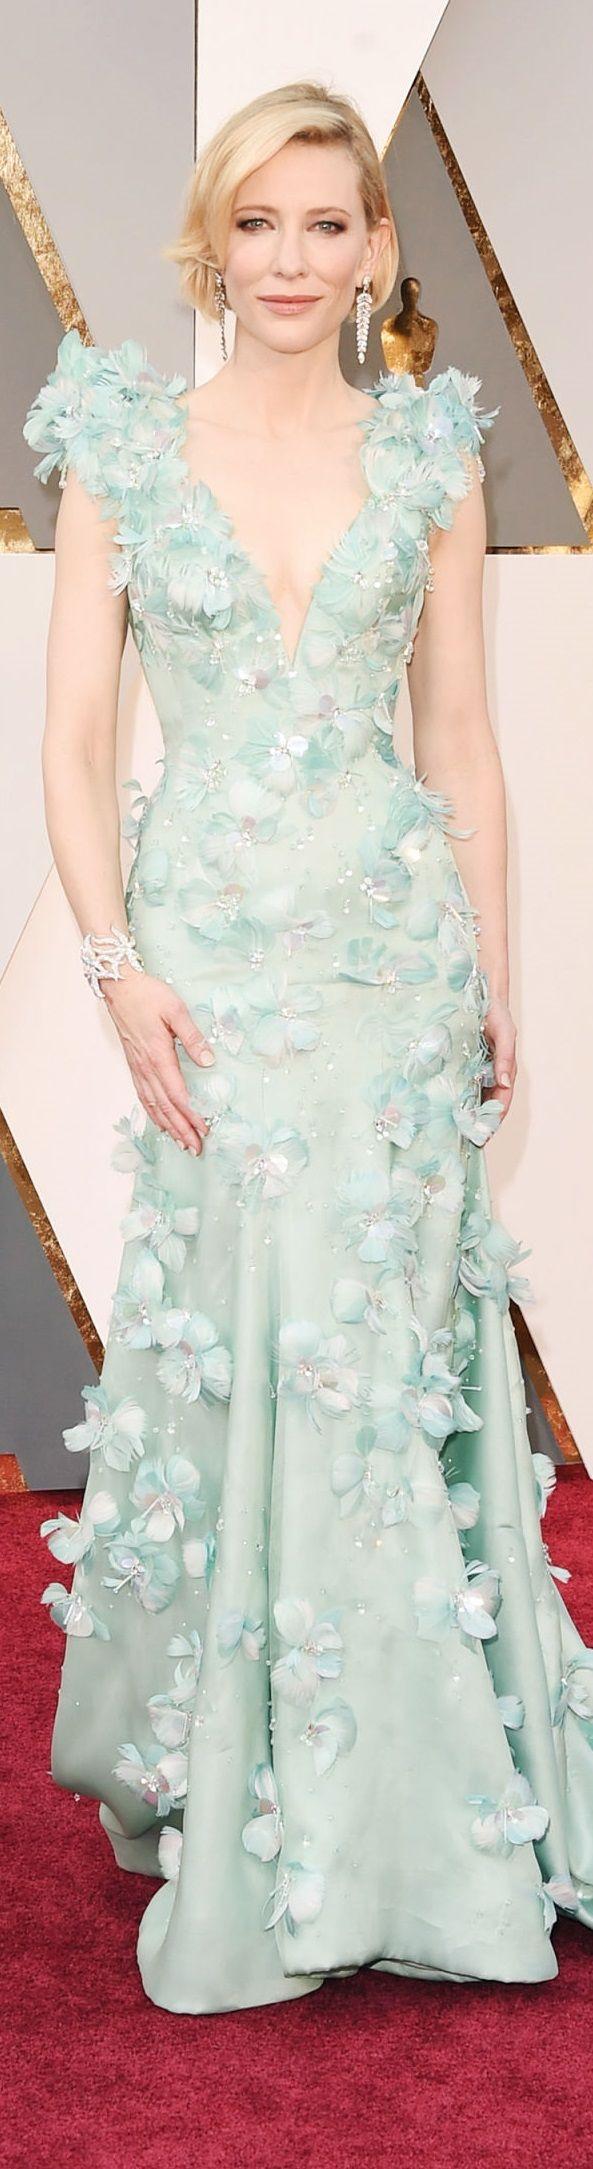 Cate Blanchett veste Armani Privé - Oscar 2016